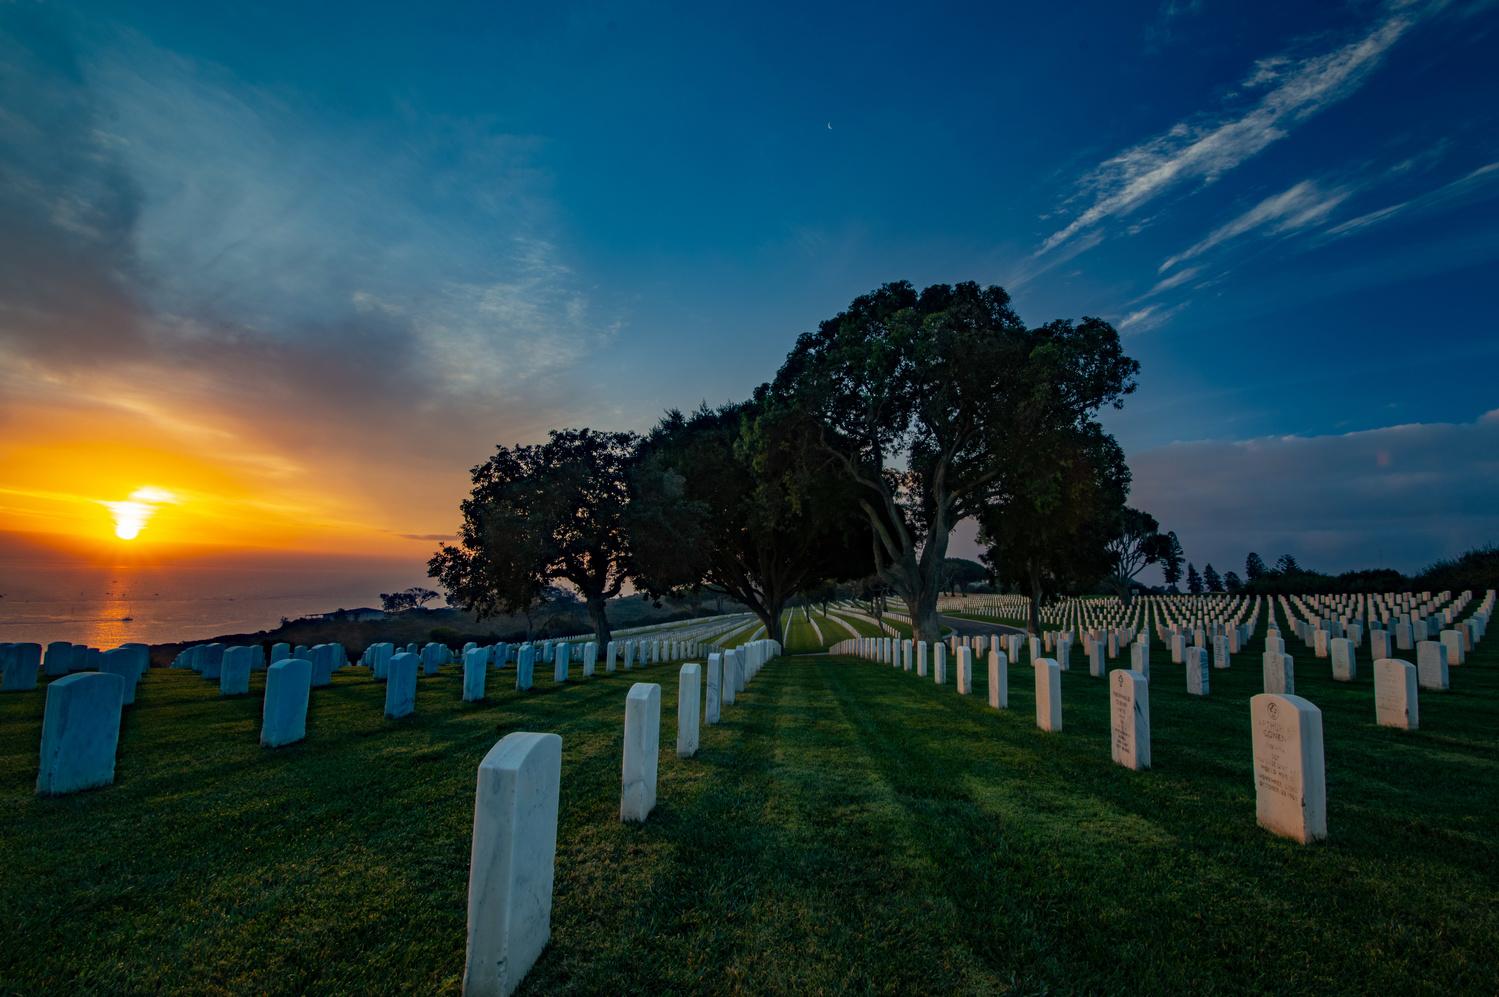 Sunrise at Fort Rosecrans National Cemetery, San Deigo, California by Ryan Fulkerson